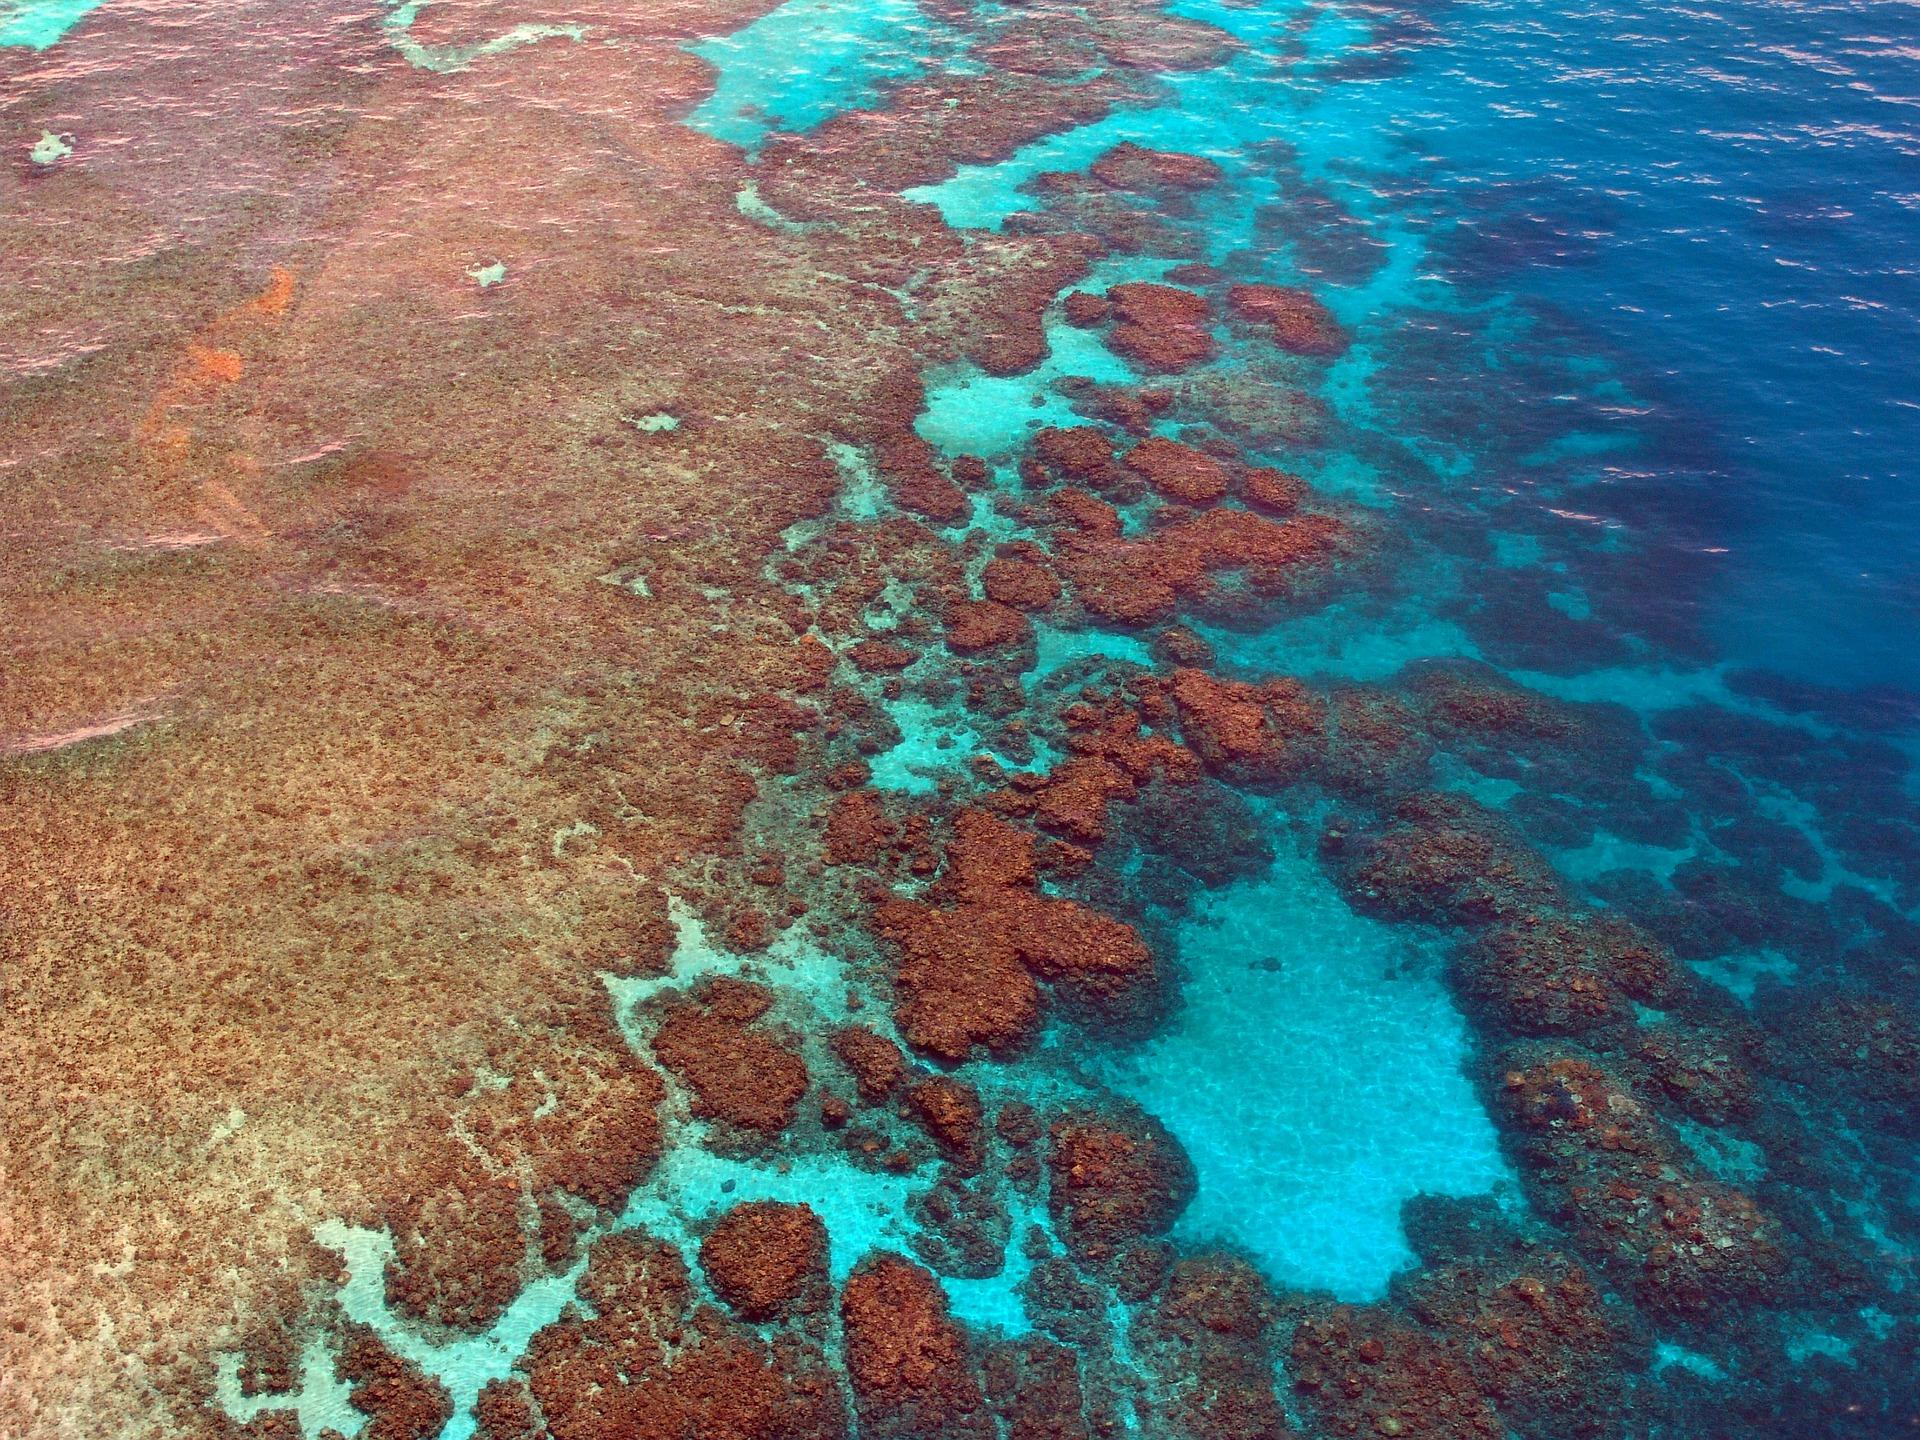 great-barrier-reef-261726_1920.jpg